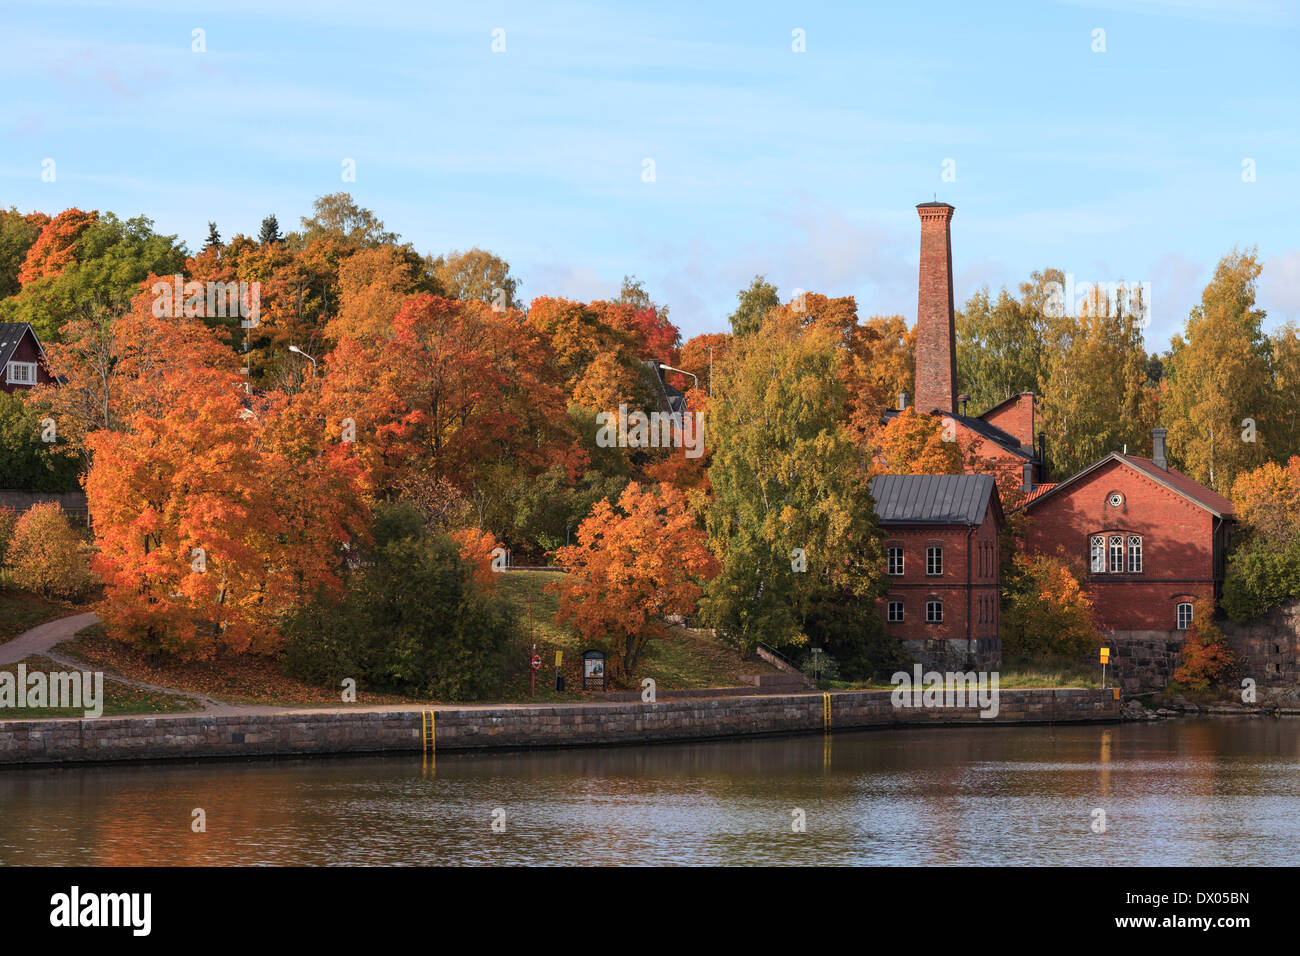 Autumn in Helsinki Arabia district. - Stock Image